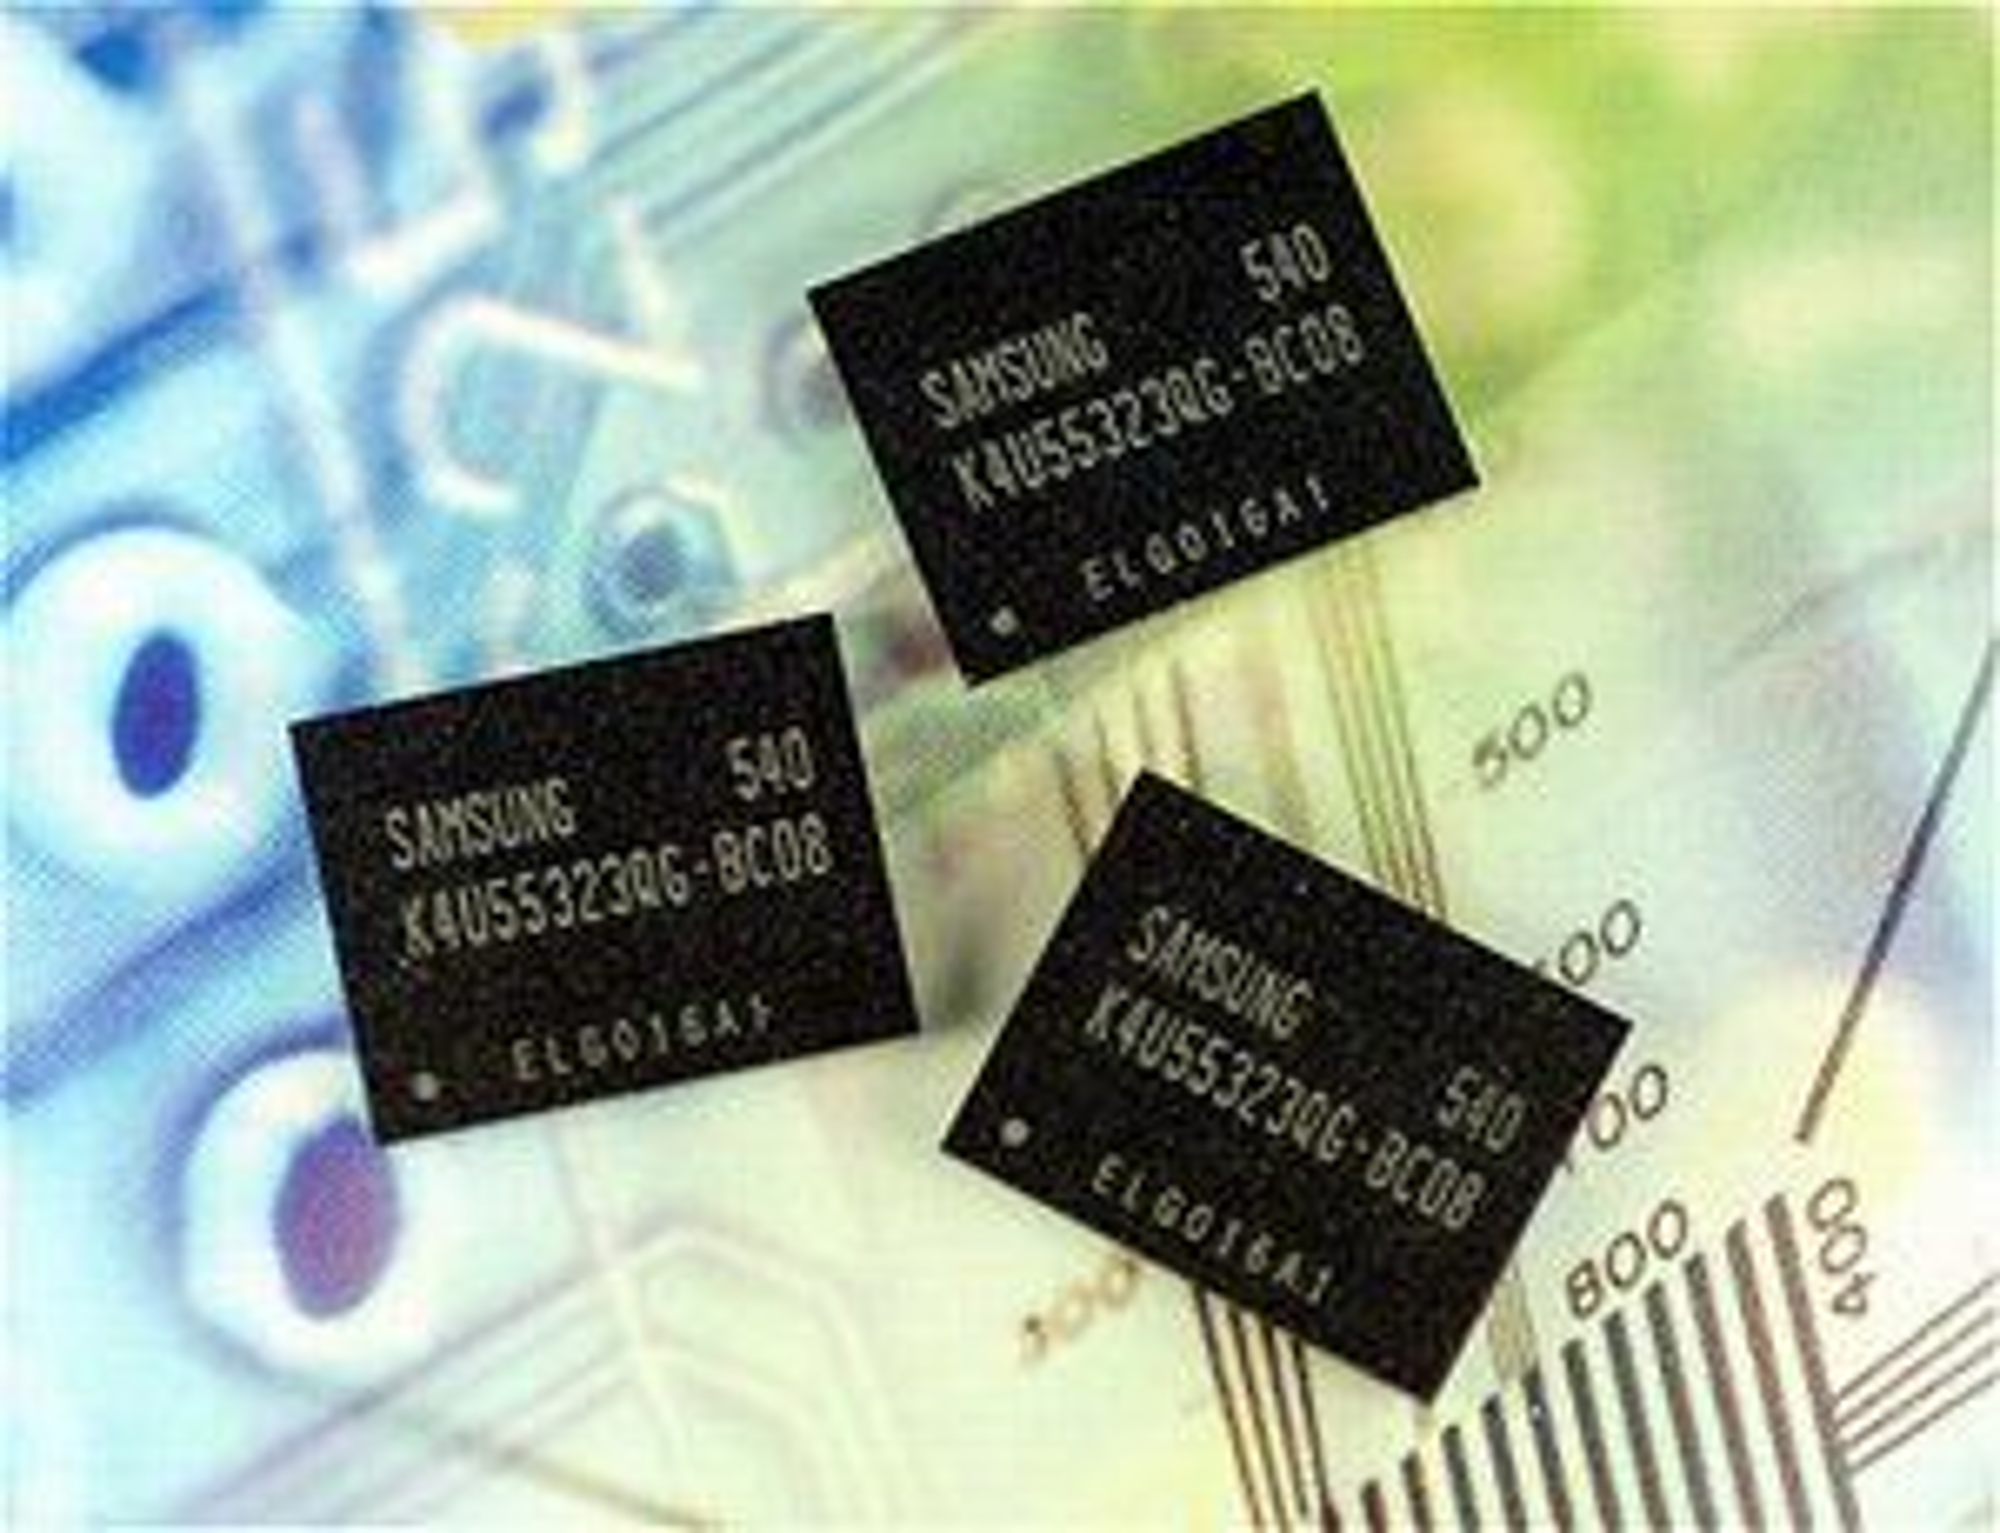 Bildet viser GDDR4-brikker fra Samsung